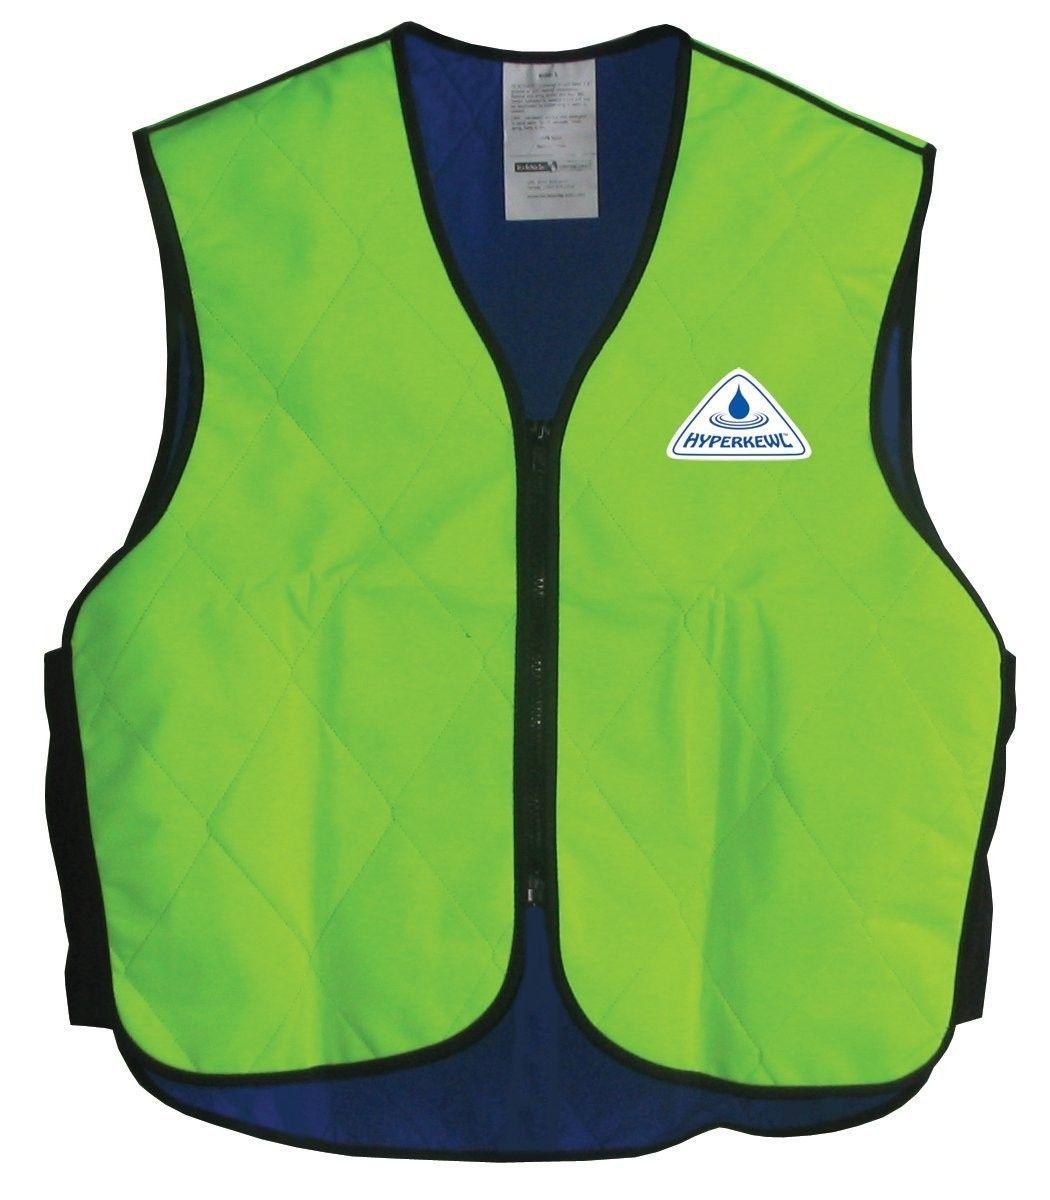 6529 Hv L Evaporative Cooling Vest C5115wng4hz Men S Clothing